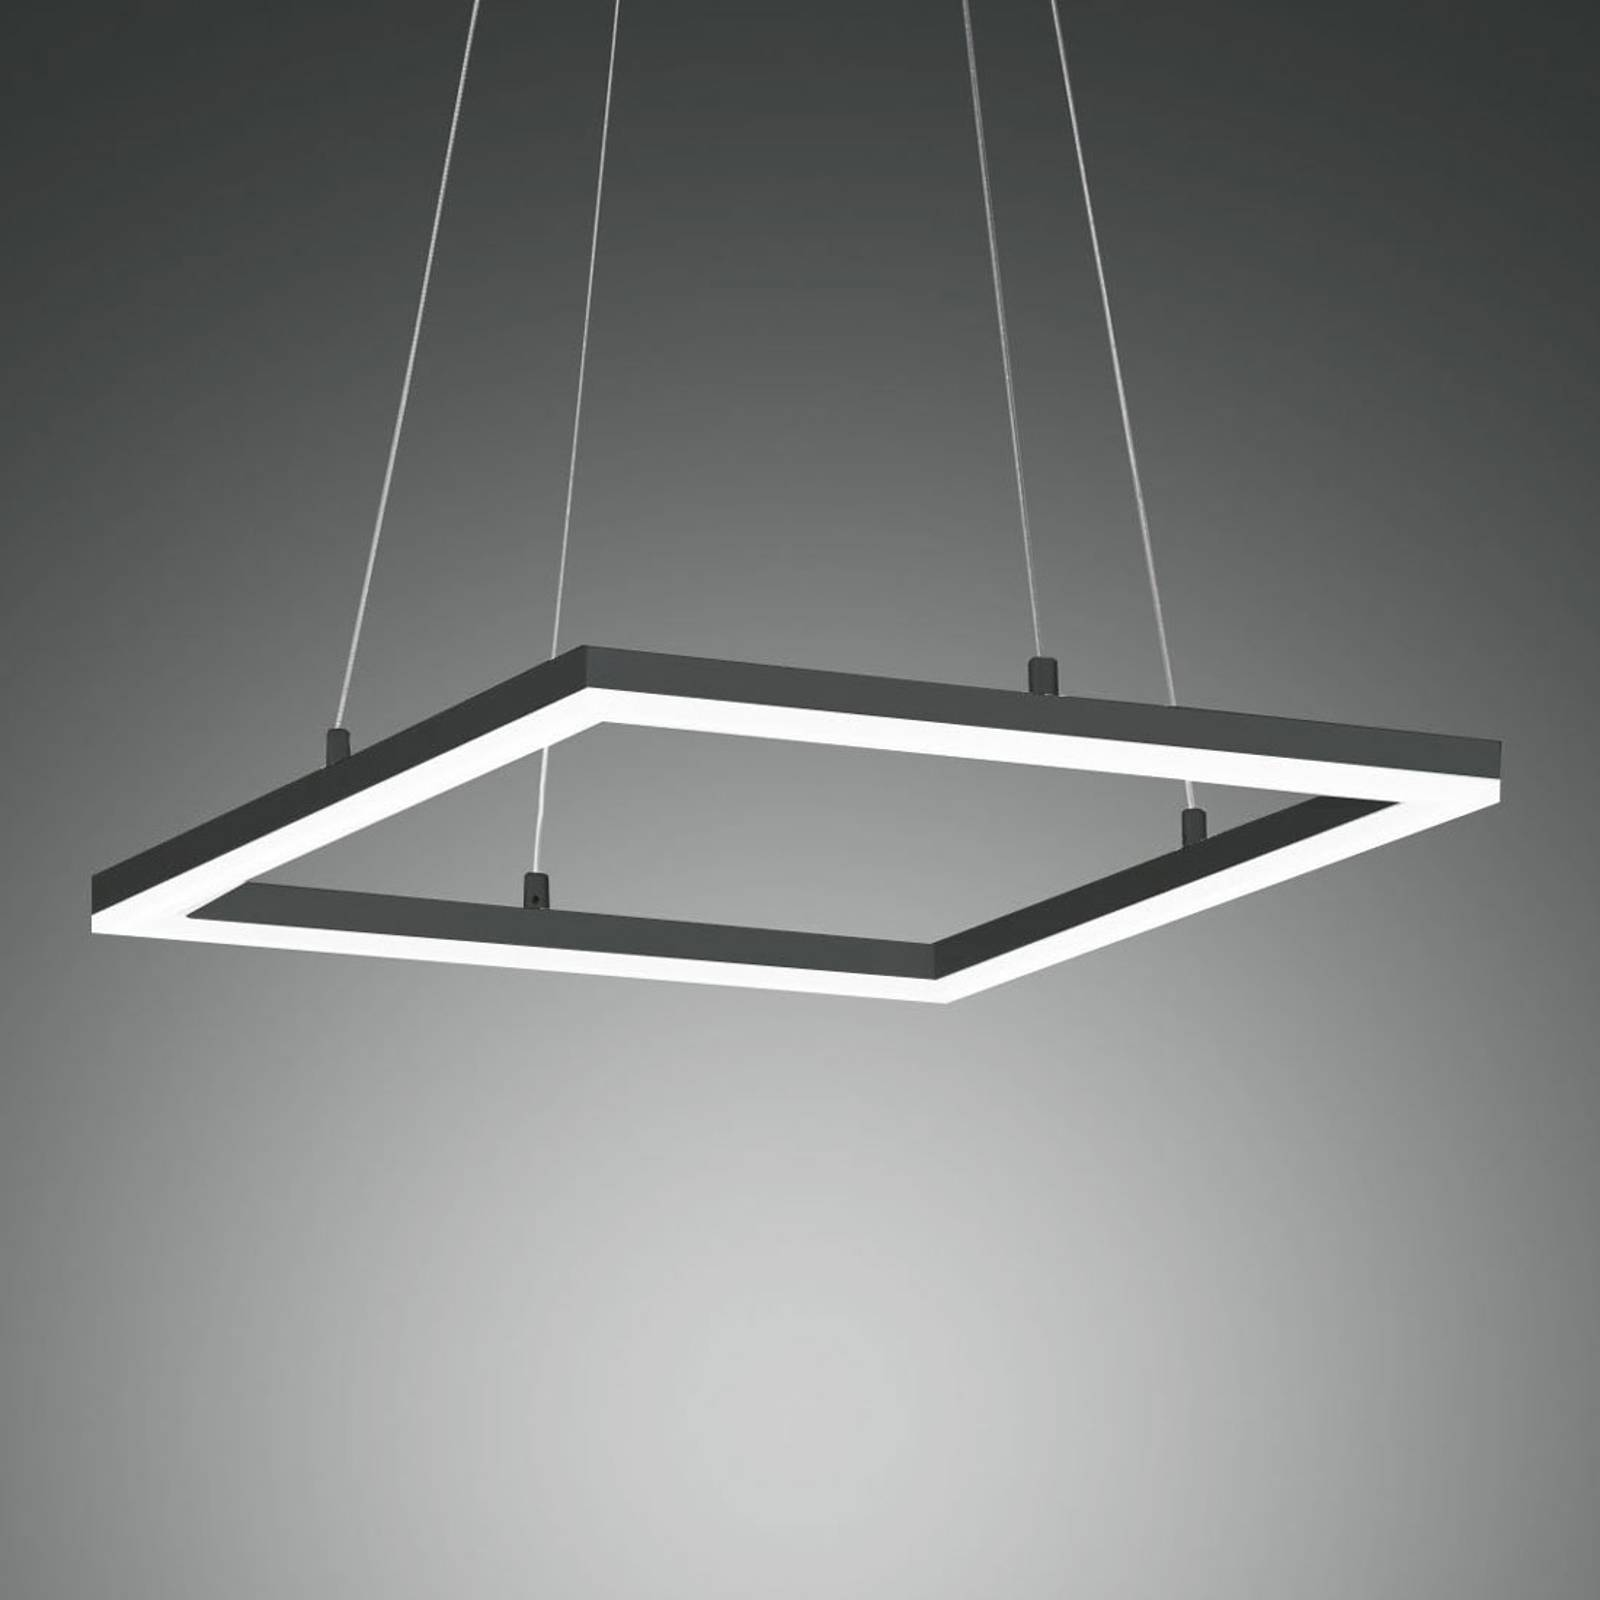 LED-riippuvalaisin Bard 42x42 cm, antrasiitti